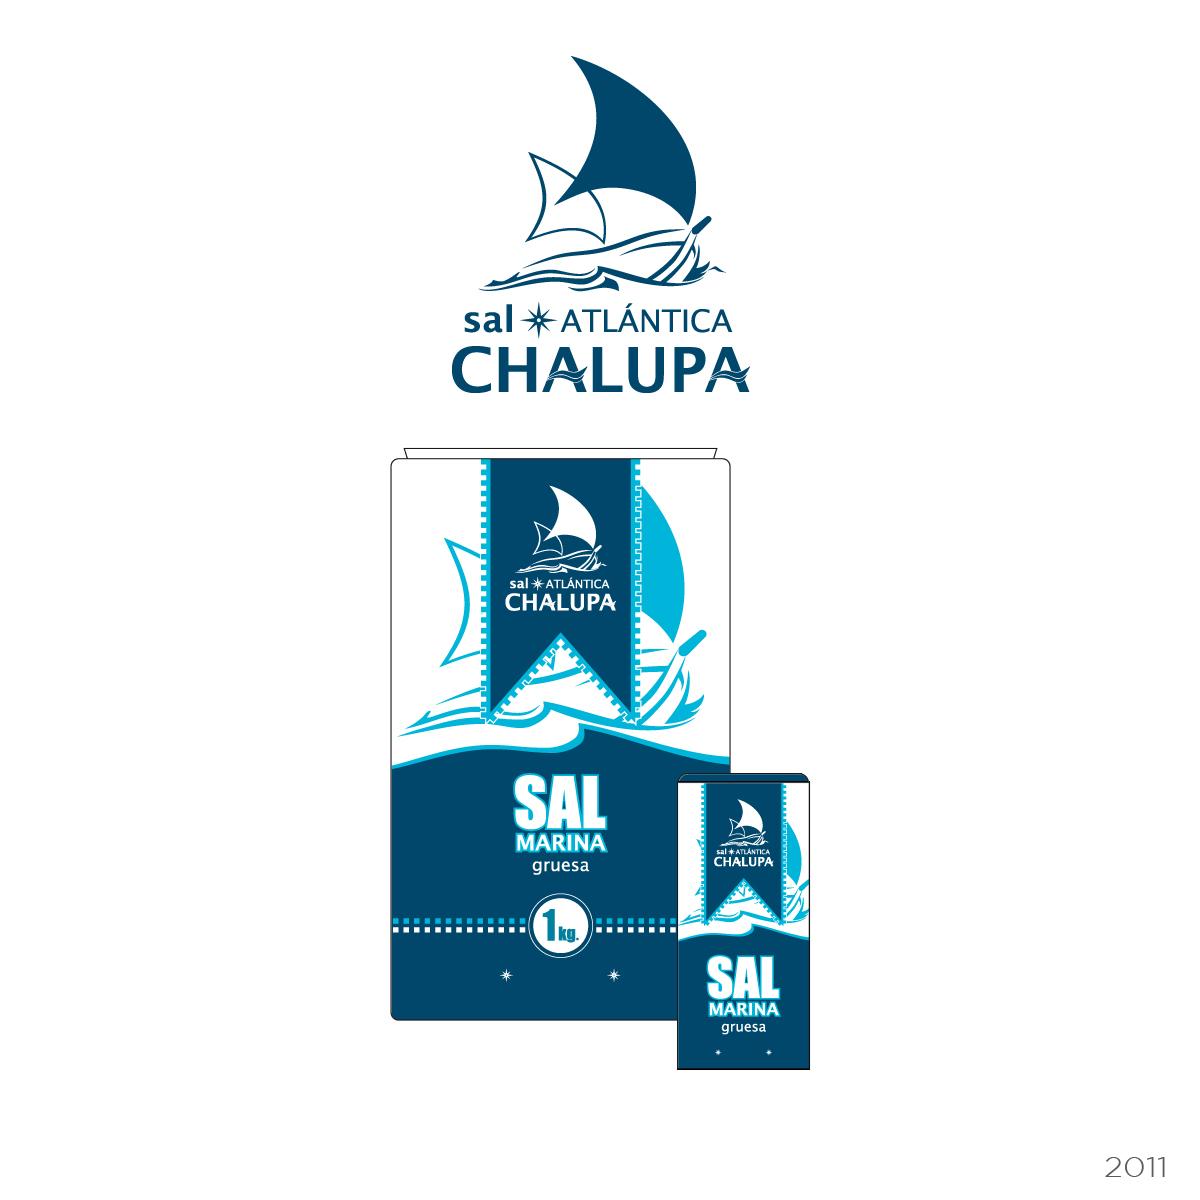 Packaging para marca de sal marina